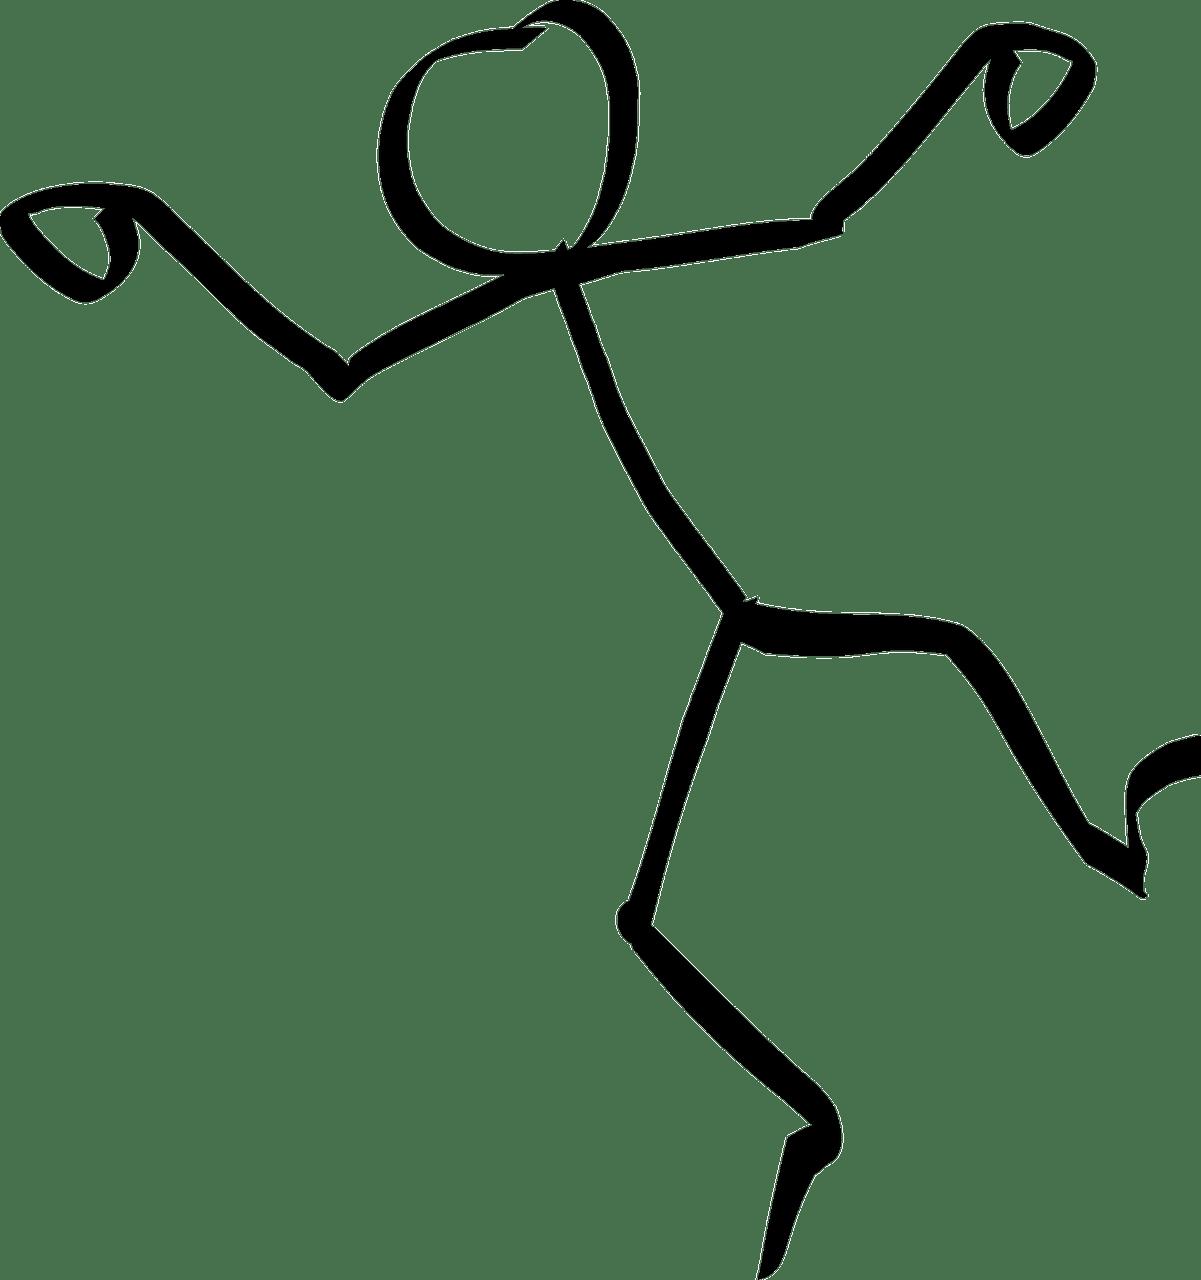 Dancing figure transparent png. Stick clipart coloring